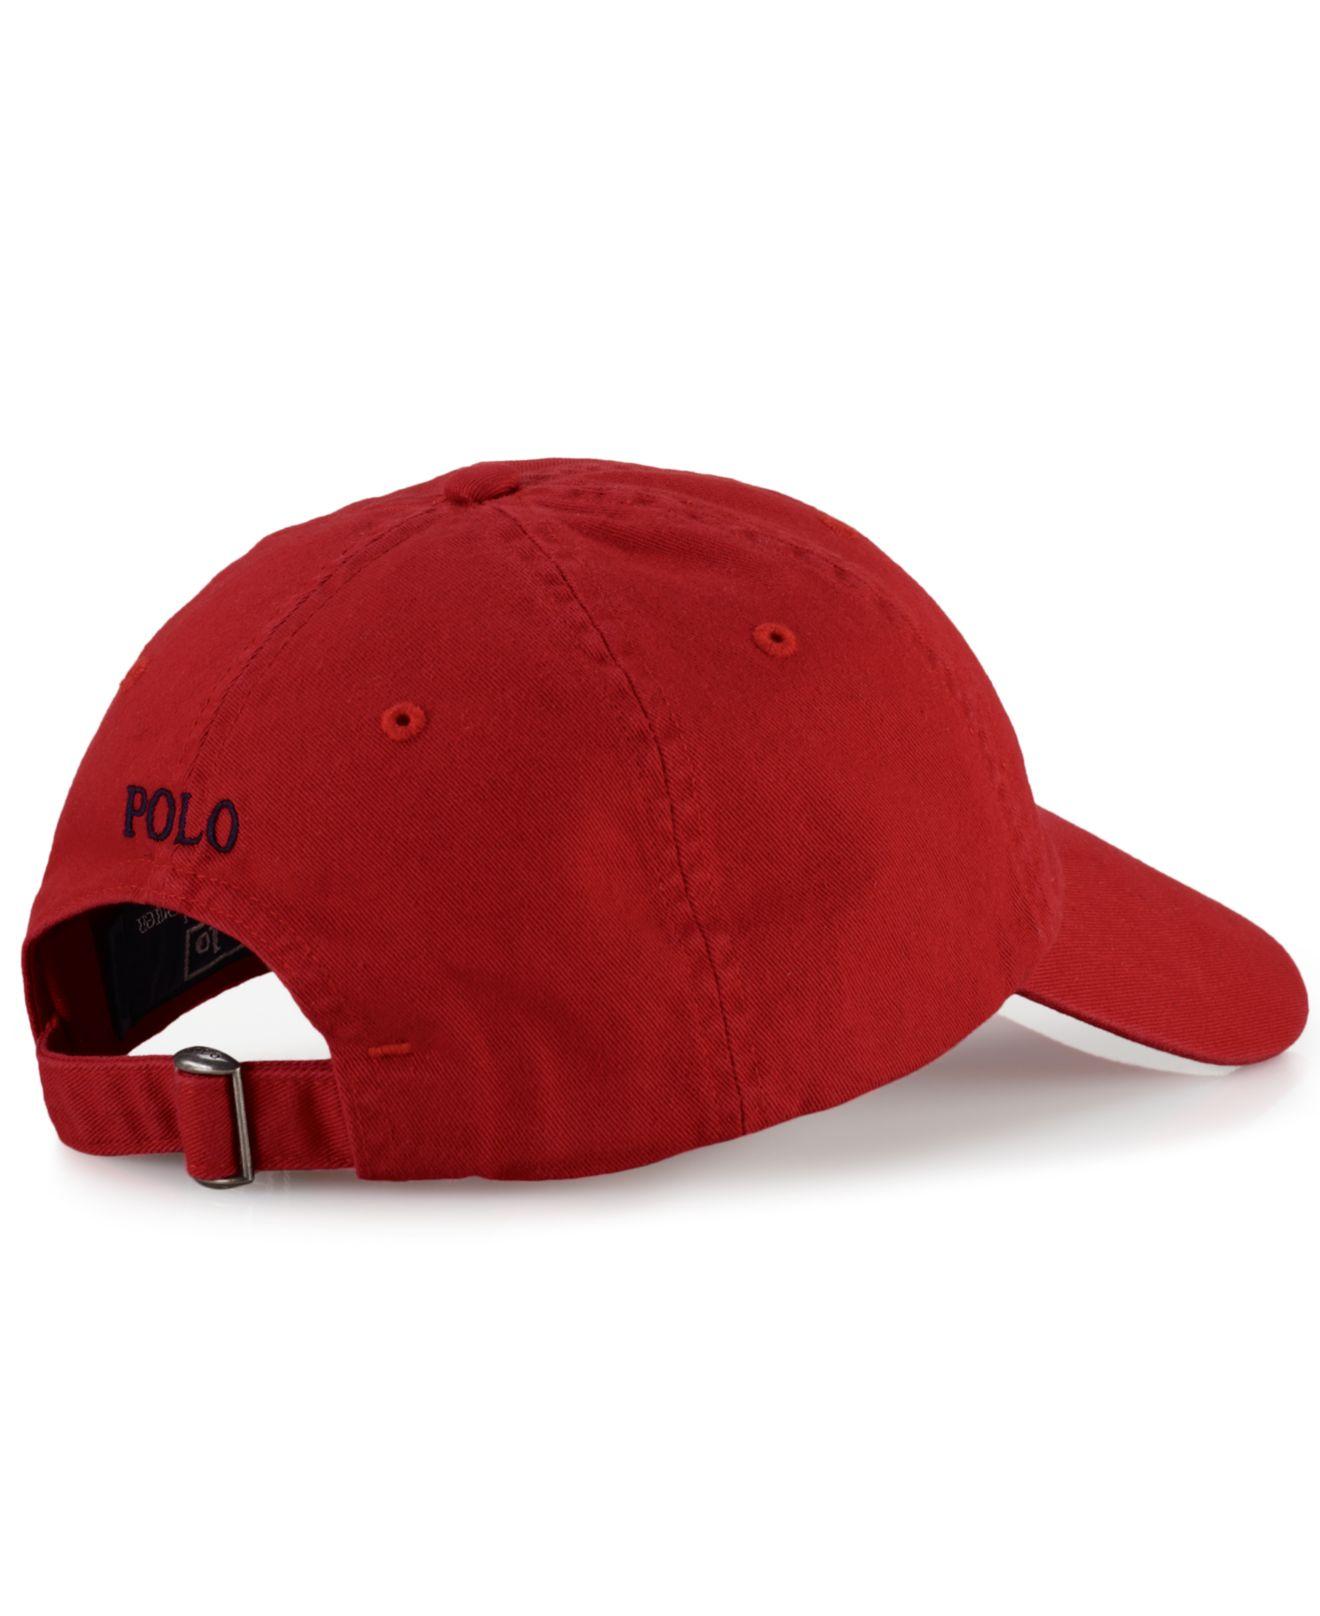 polo ralph lauren core classic sport cap in red for men lyst. Black Bedroom Furniture Sets. Home Design Ideas